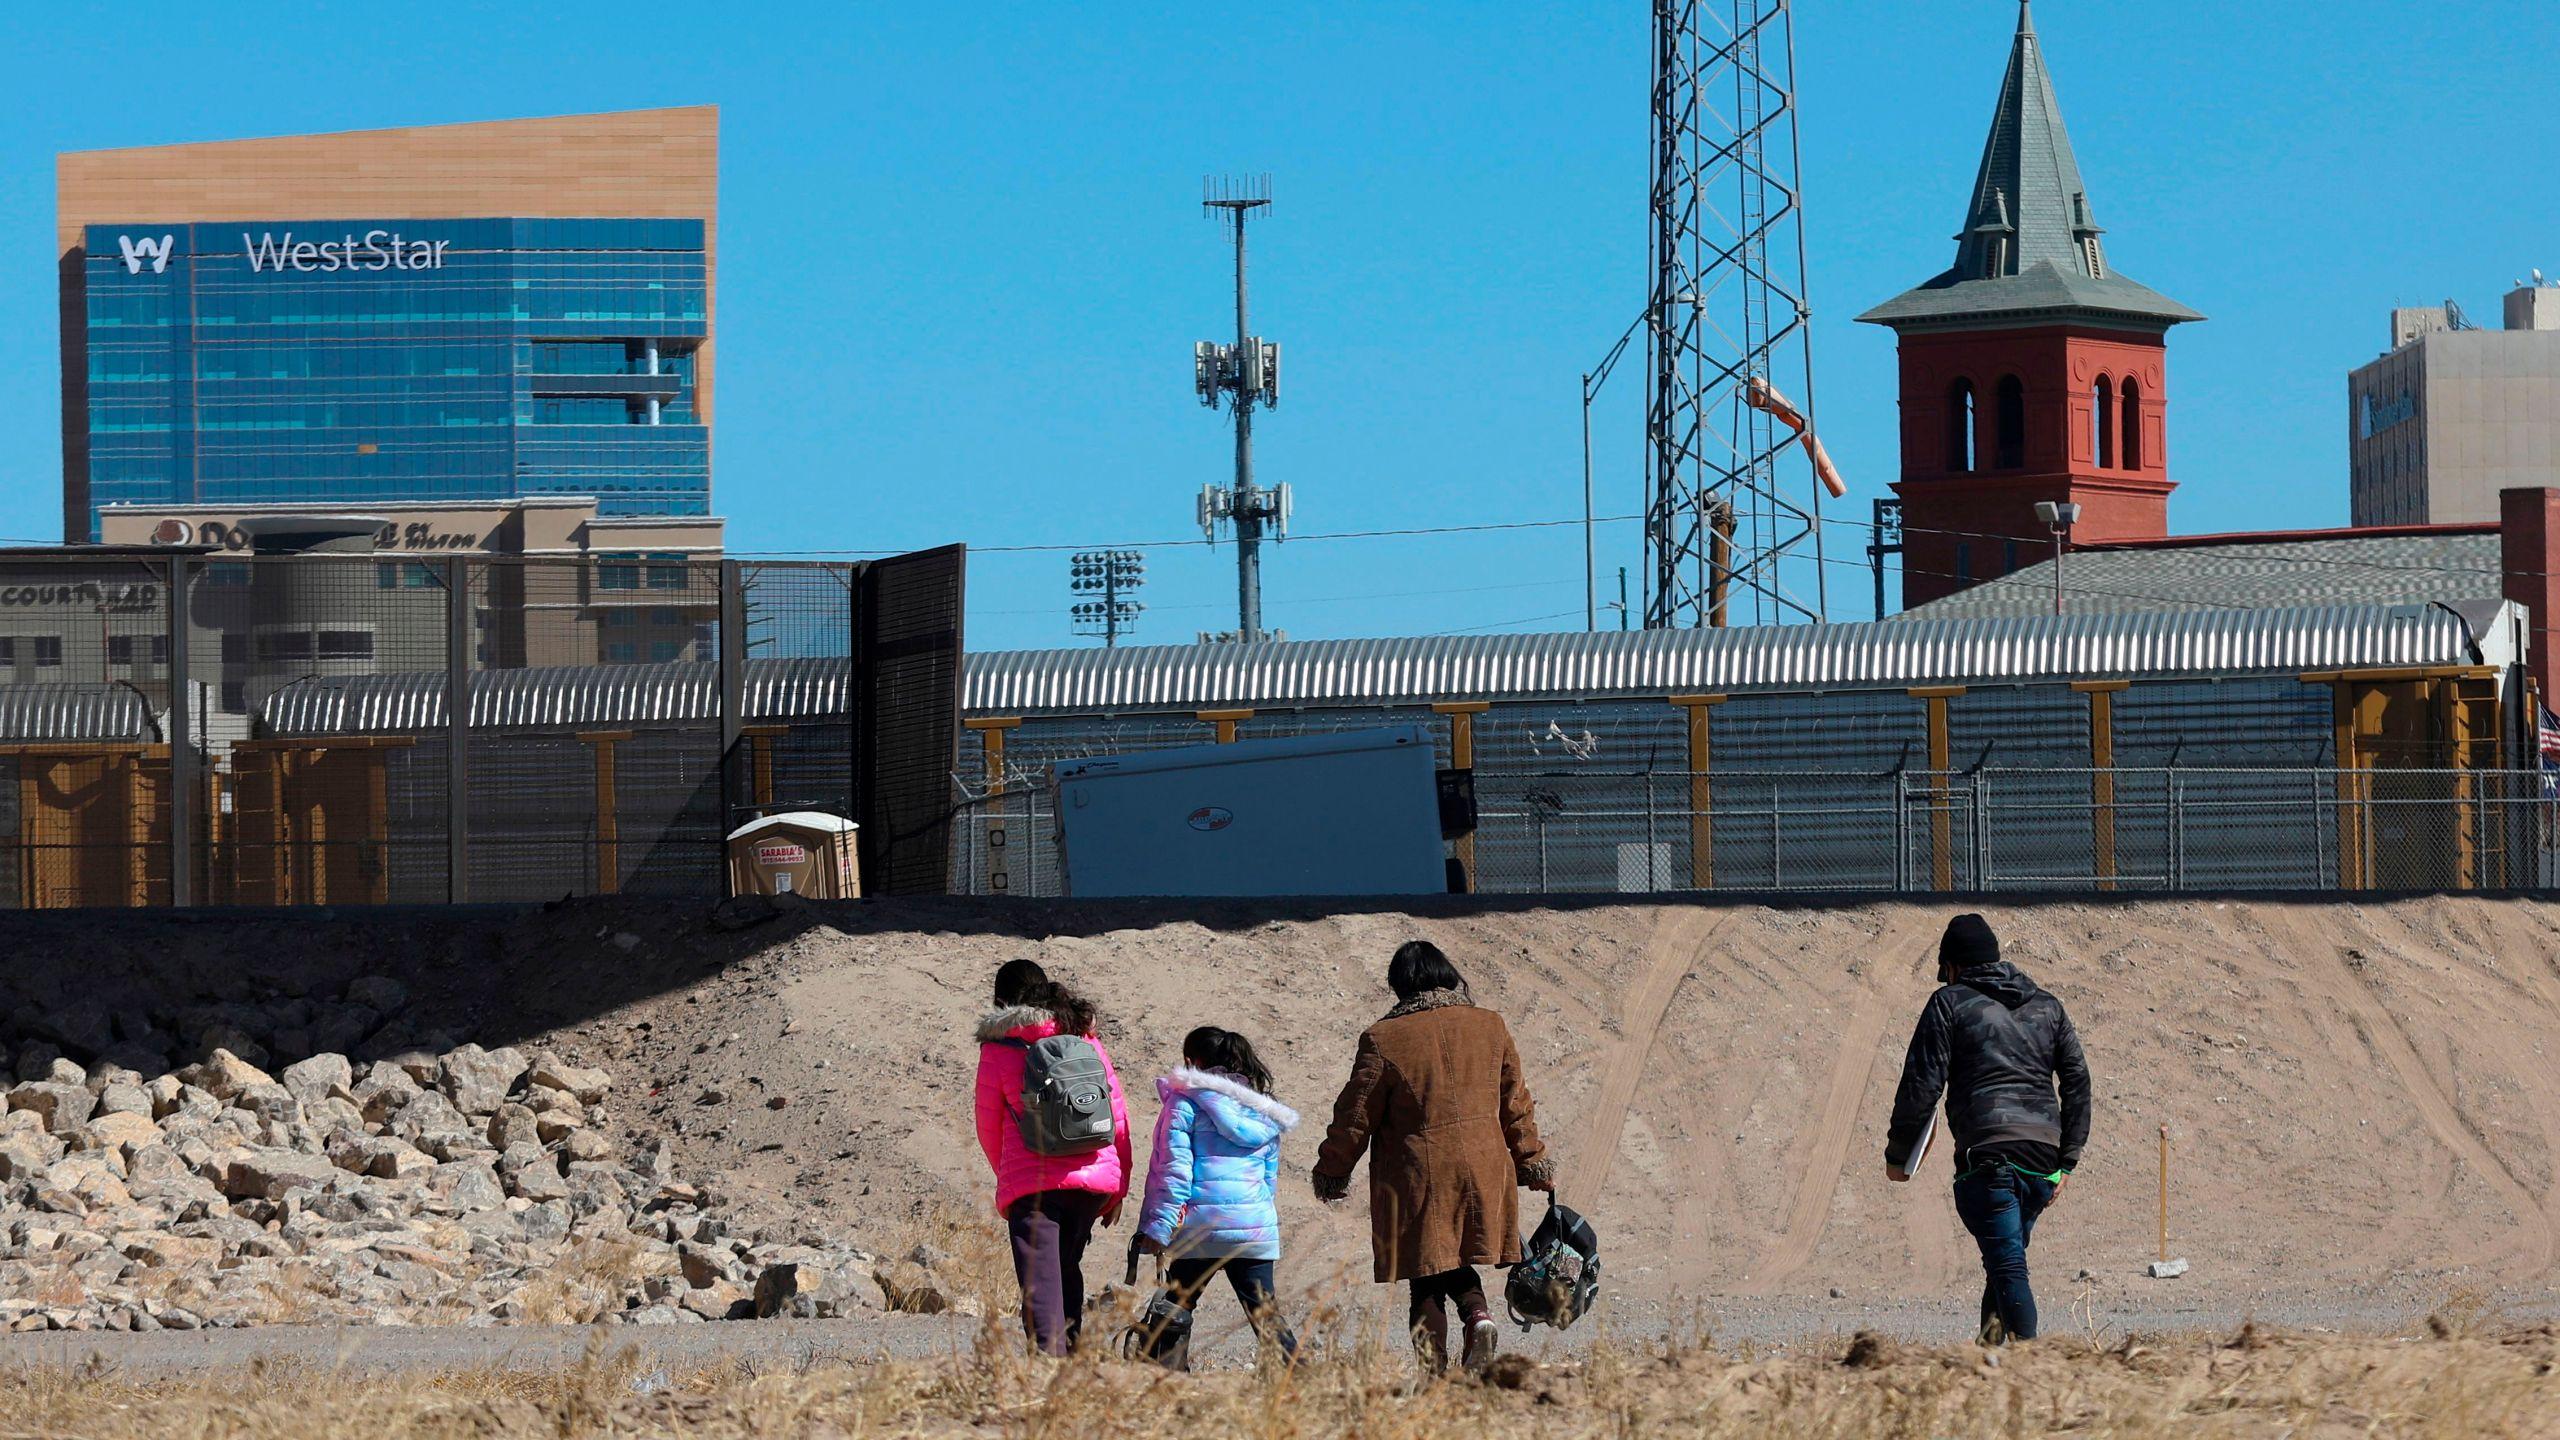 Migrants cross the Rio Bravo to get to El Paso, Texas, from Ciudad Juarez, Mexico, on Feb. 5, 2021. (Herika Martinez / AFP / Getty Images)